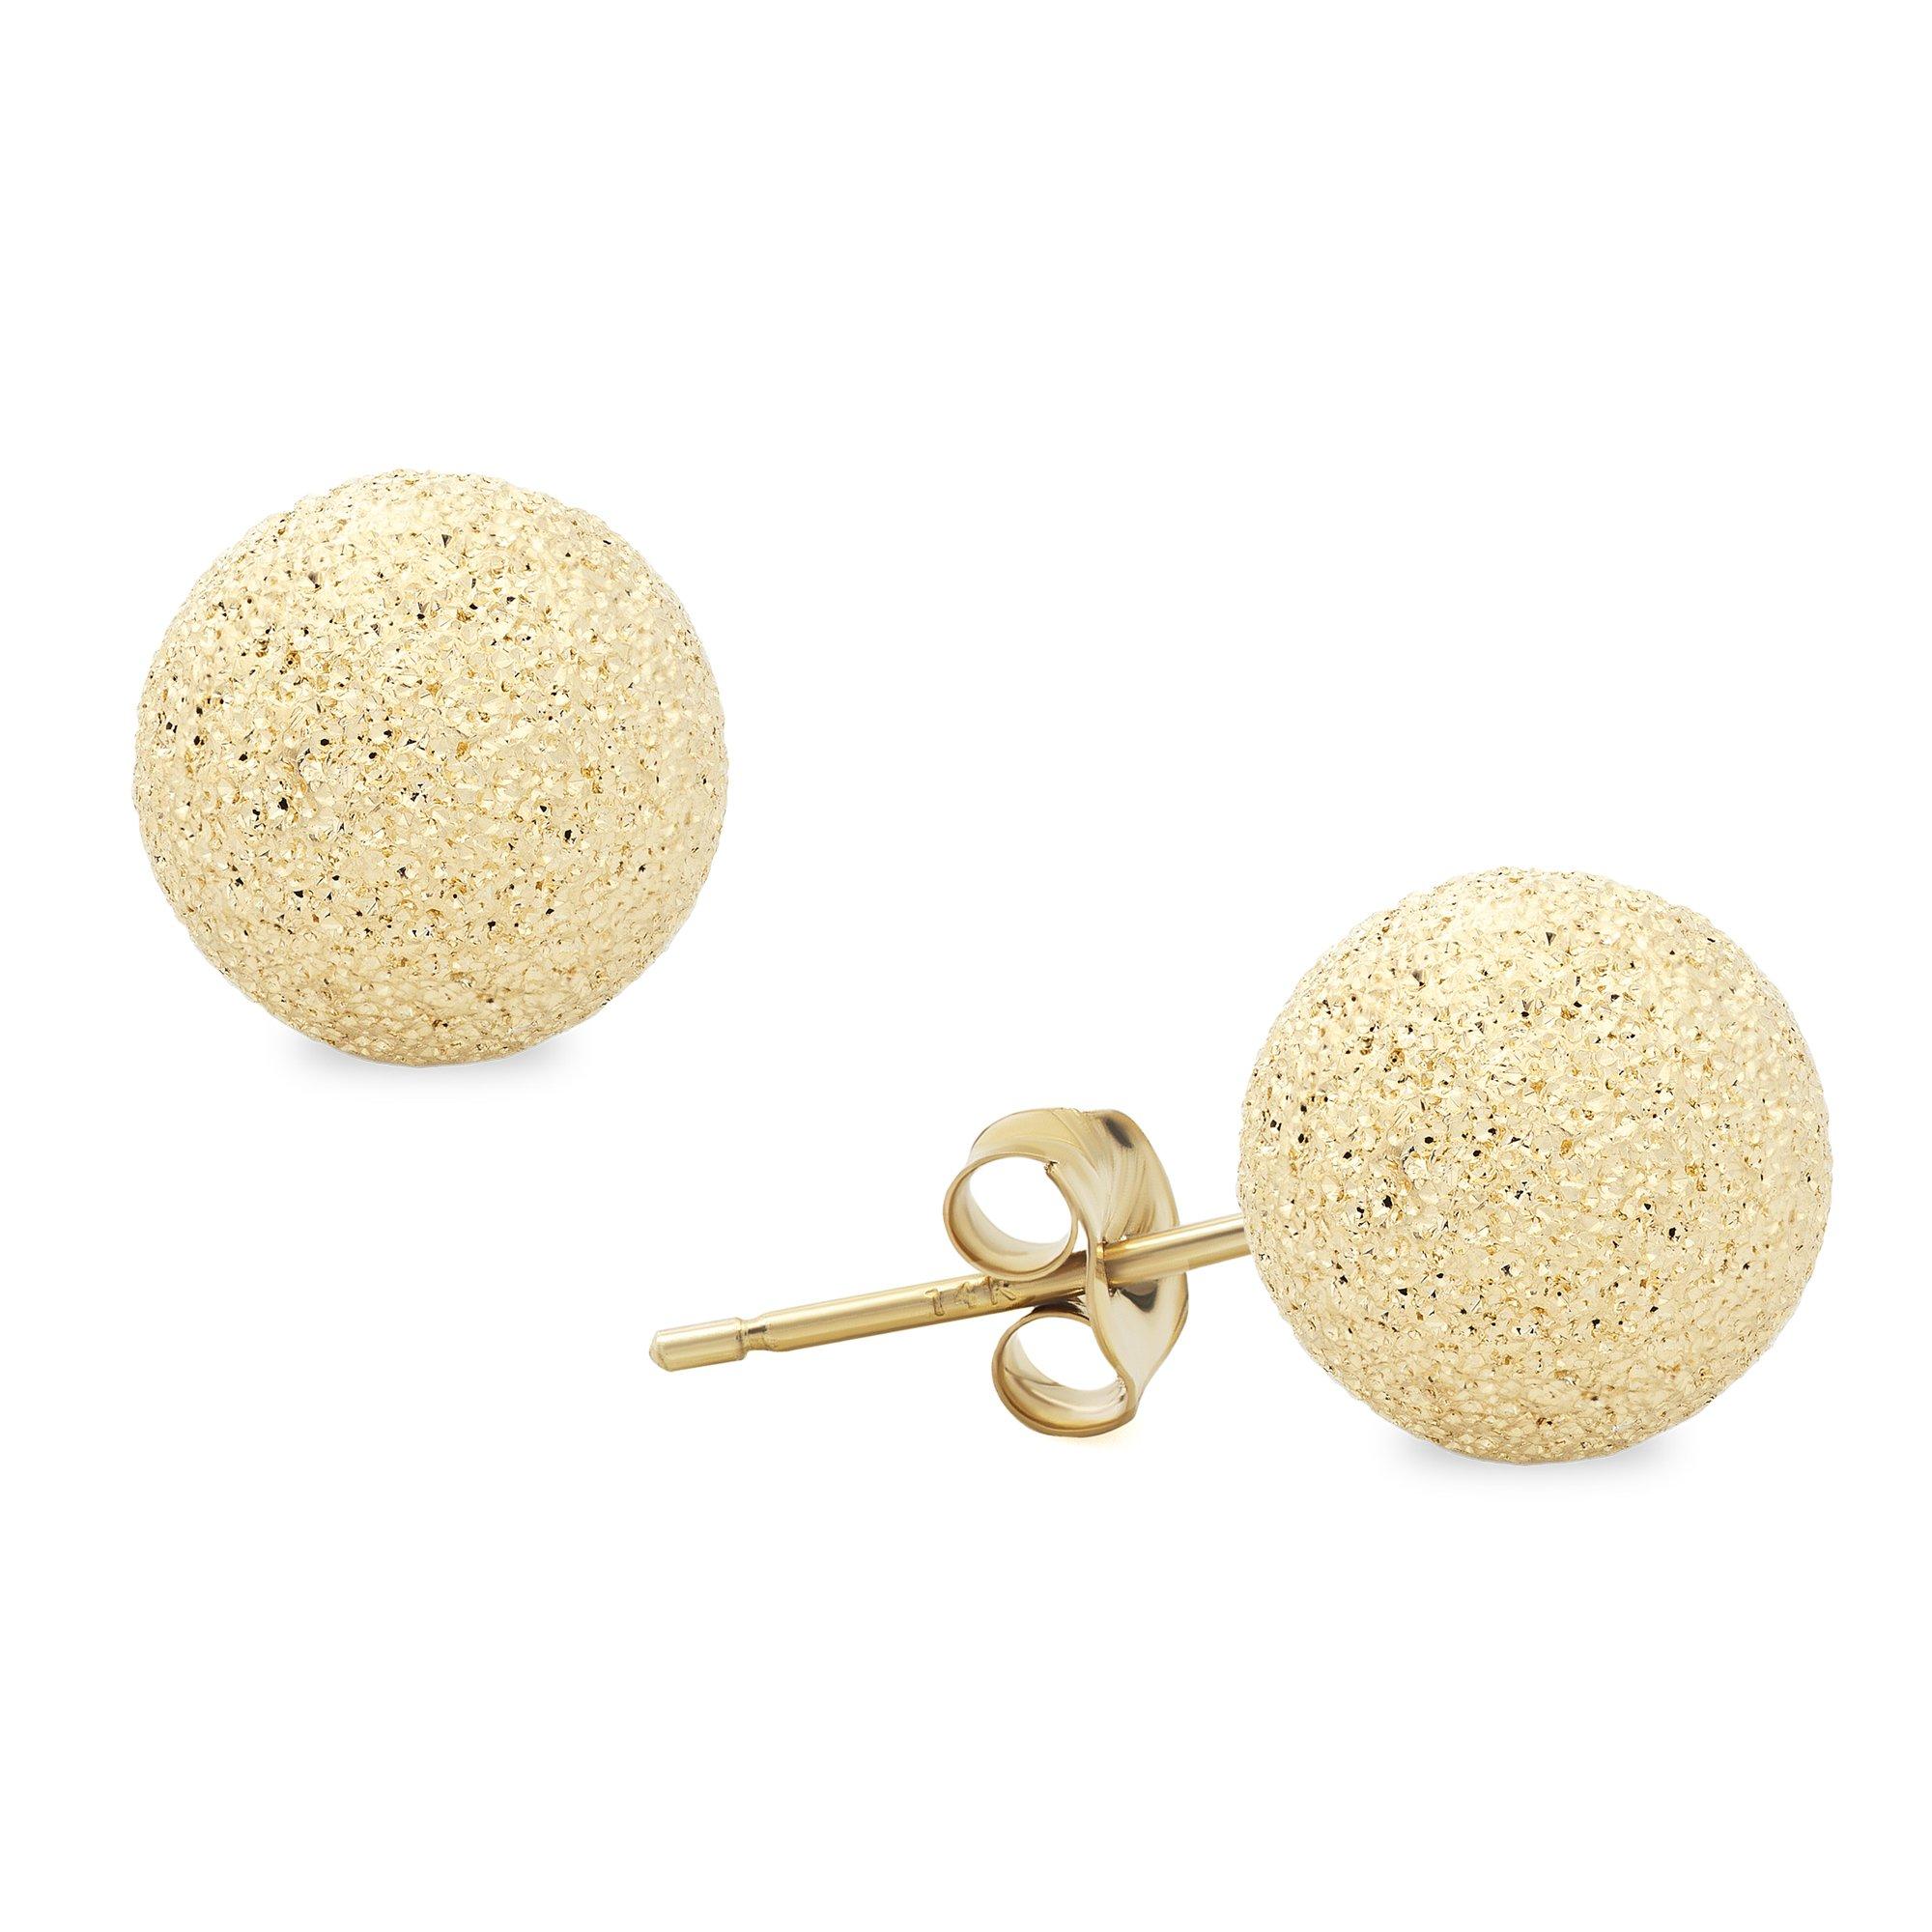 14K Yellow Gold StarDust Ball Studs Earrings (7 Millimeters)